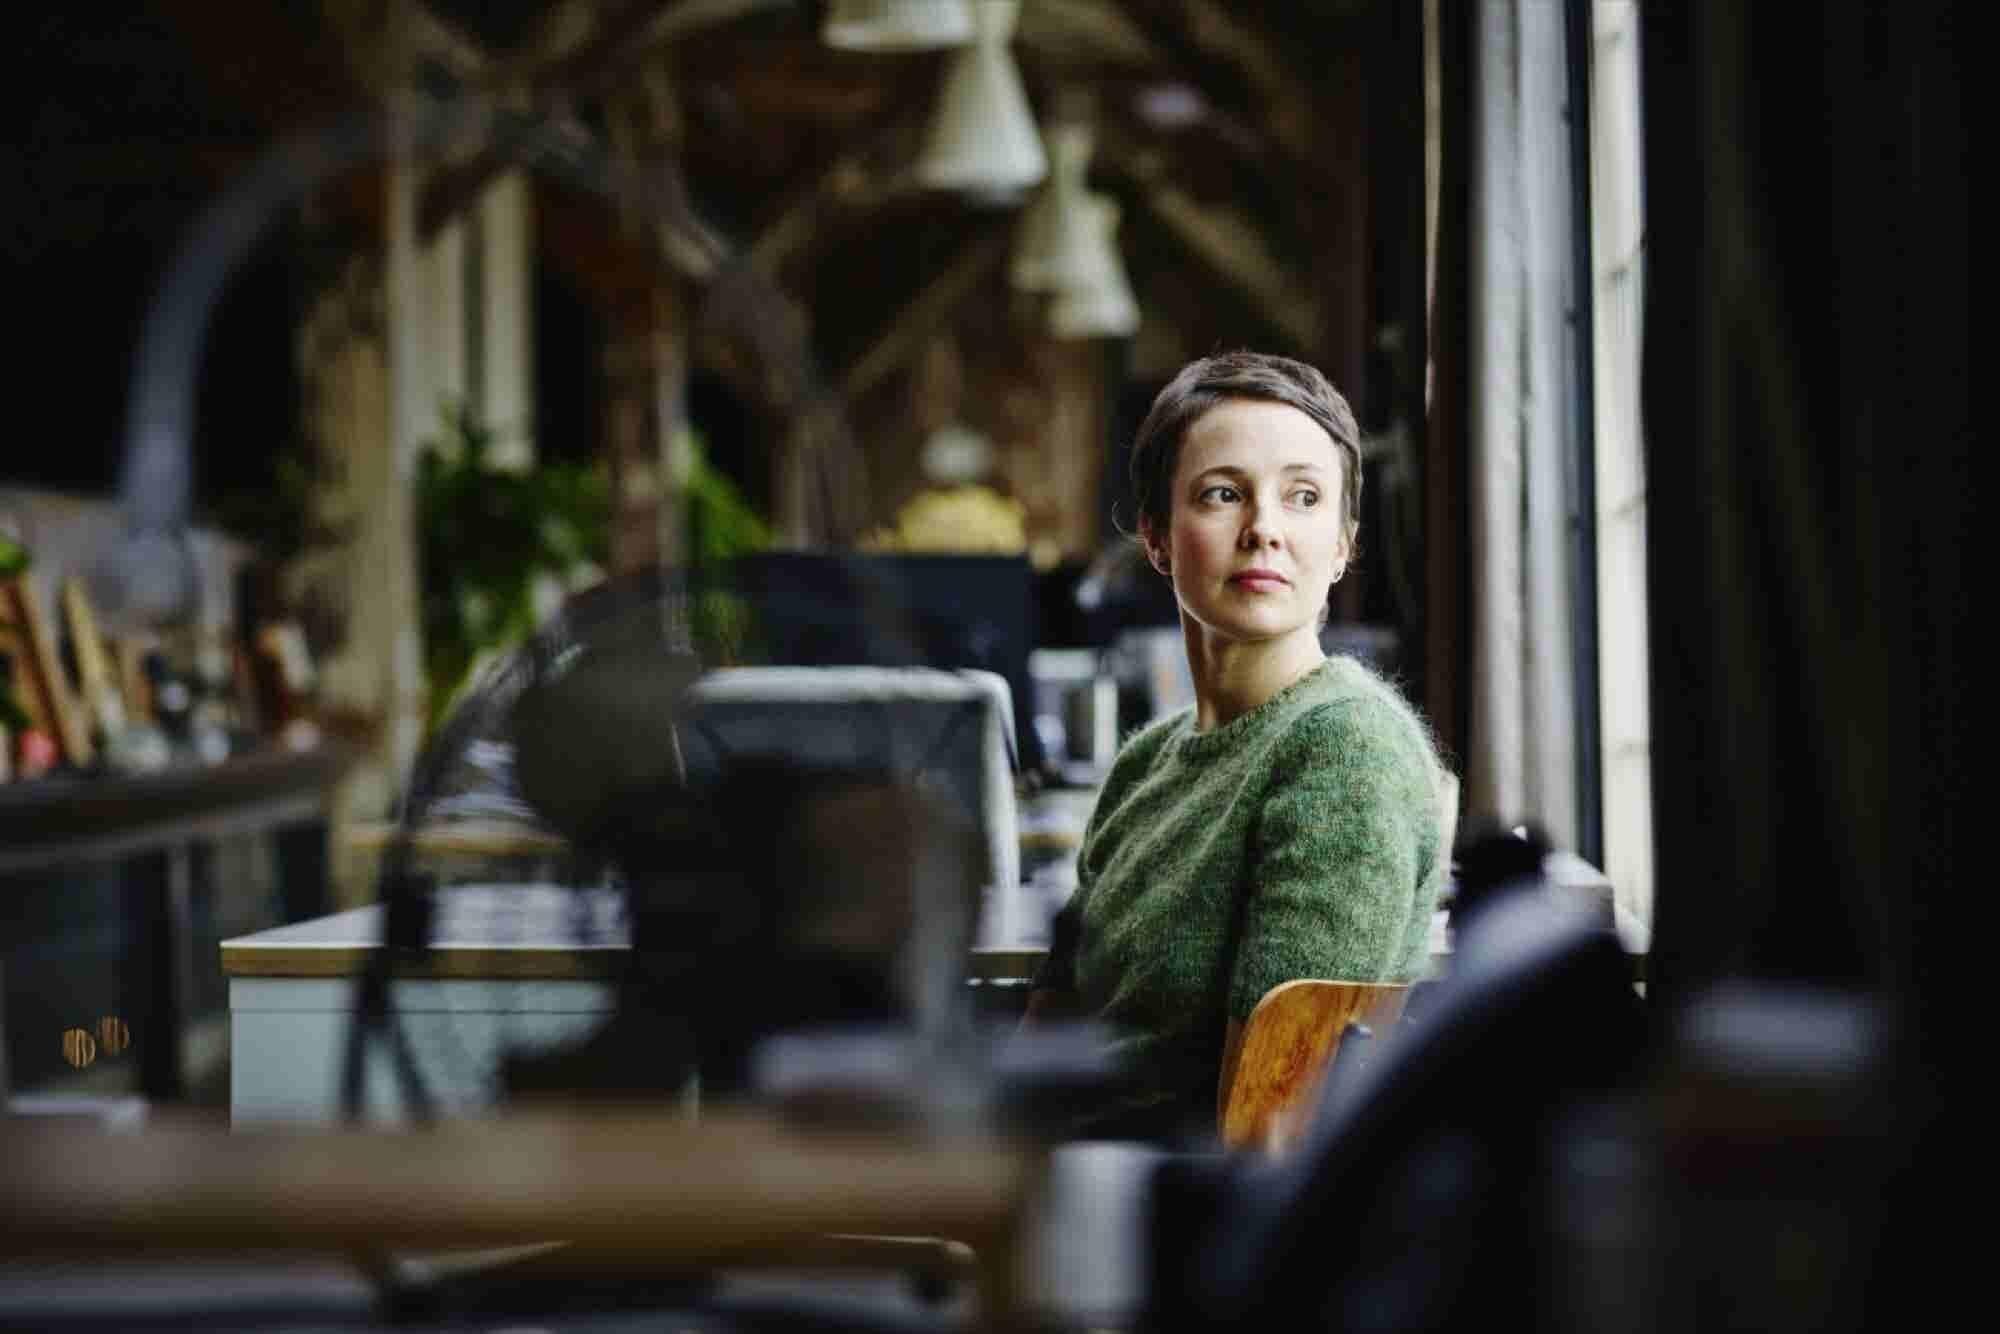 3 Problems Stunting Entrepreneurship Across the U.S.